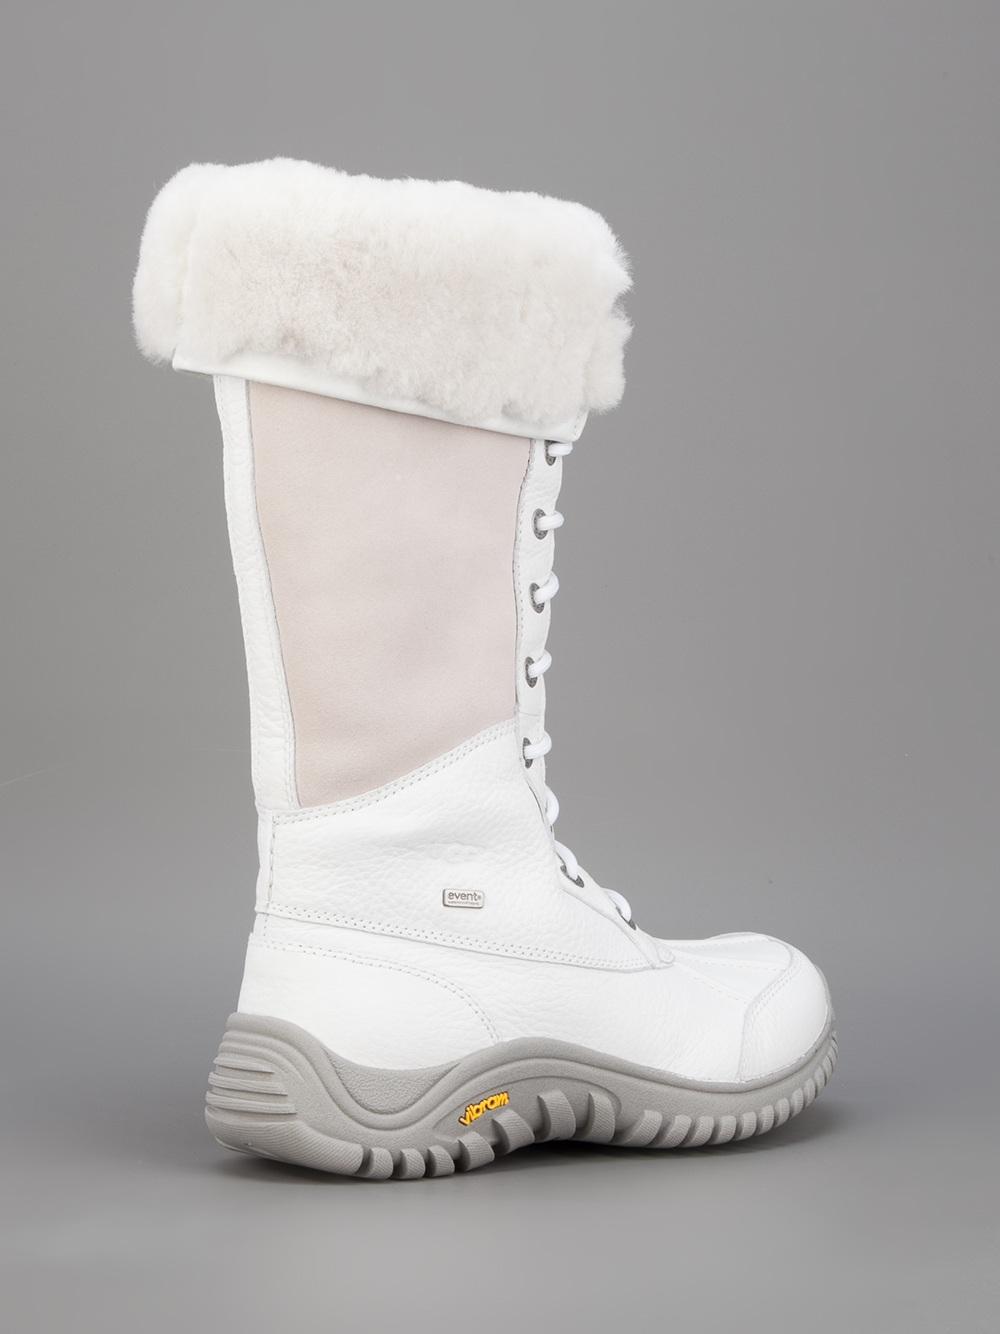 Ugg Adirondack Snow Boot In White Lyst